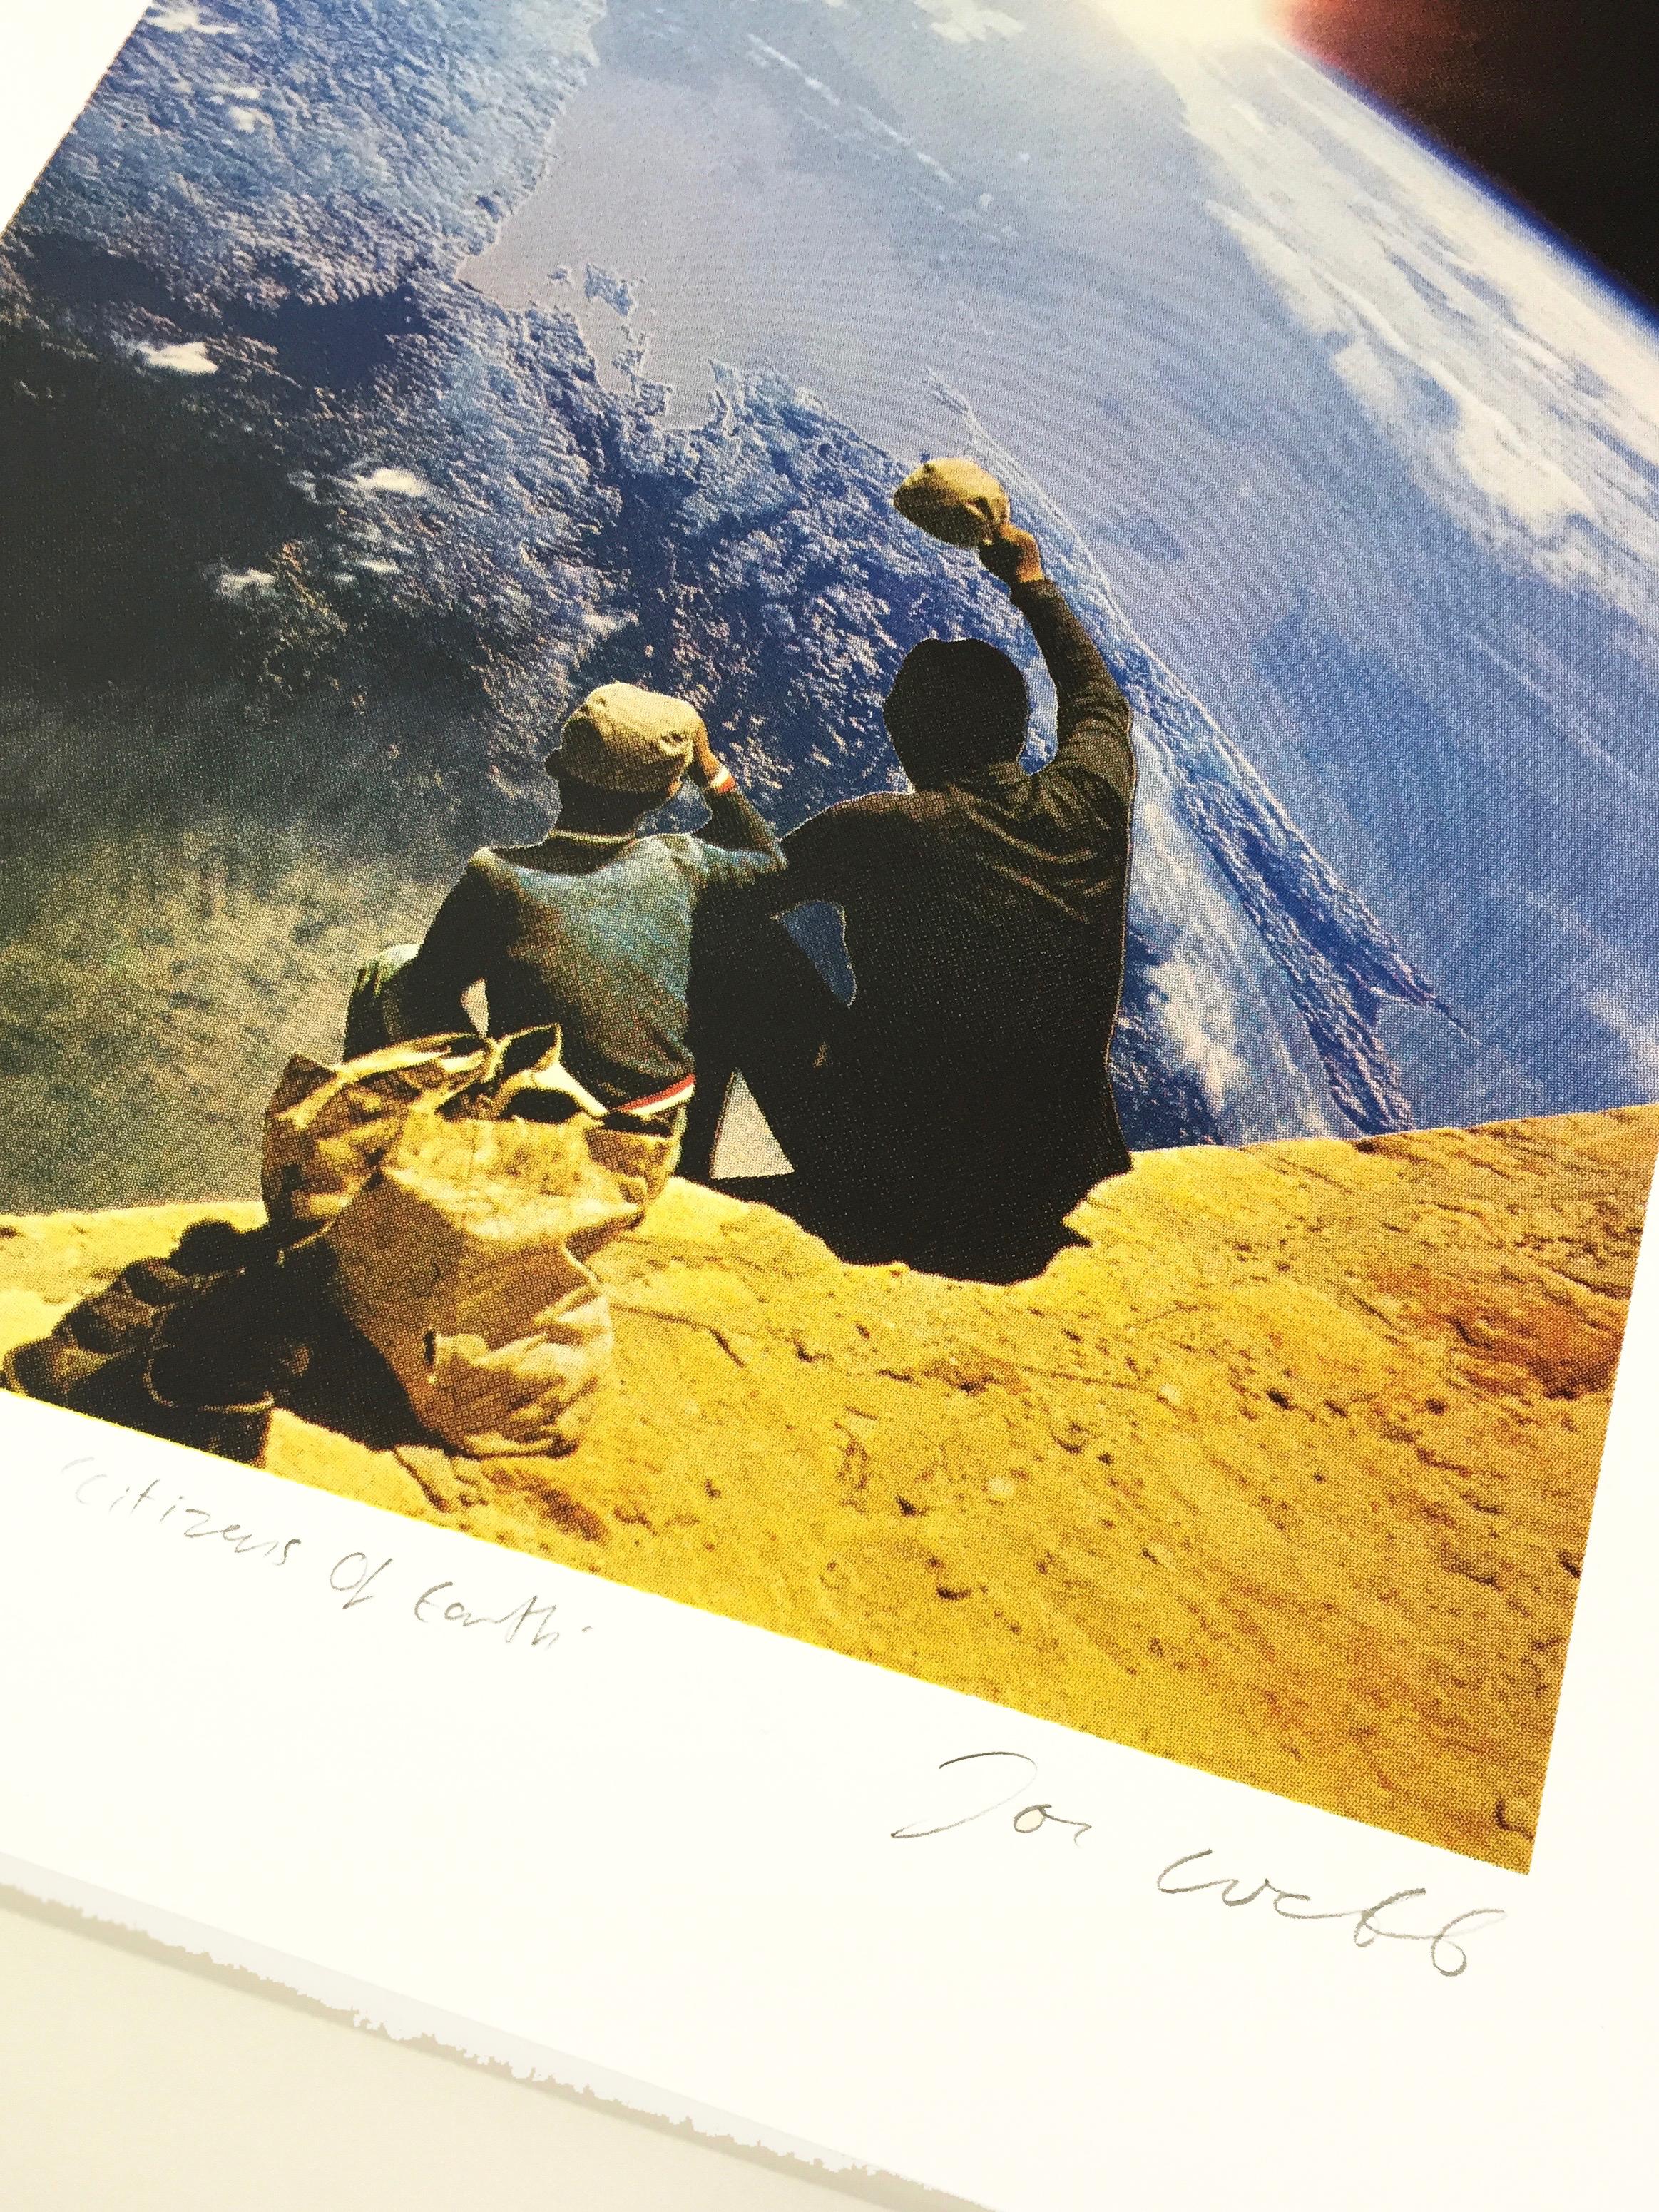 Joe Webb 'Citizens of Earth'